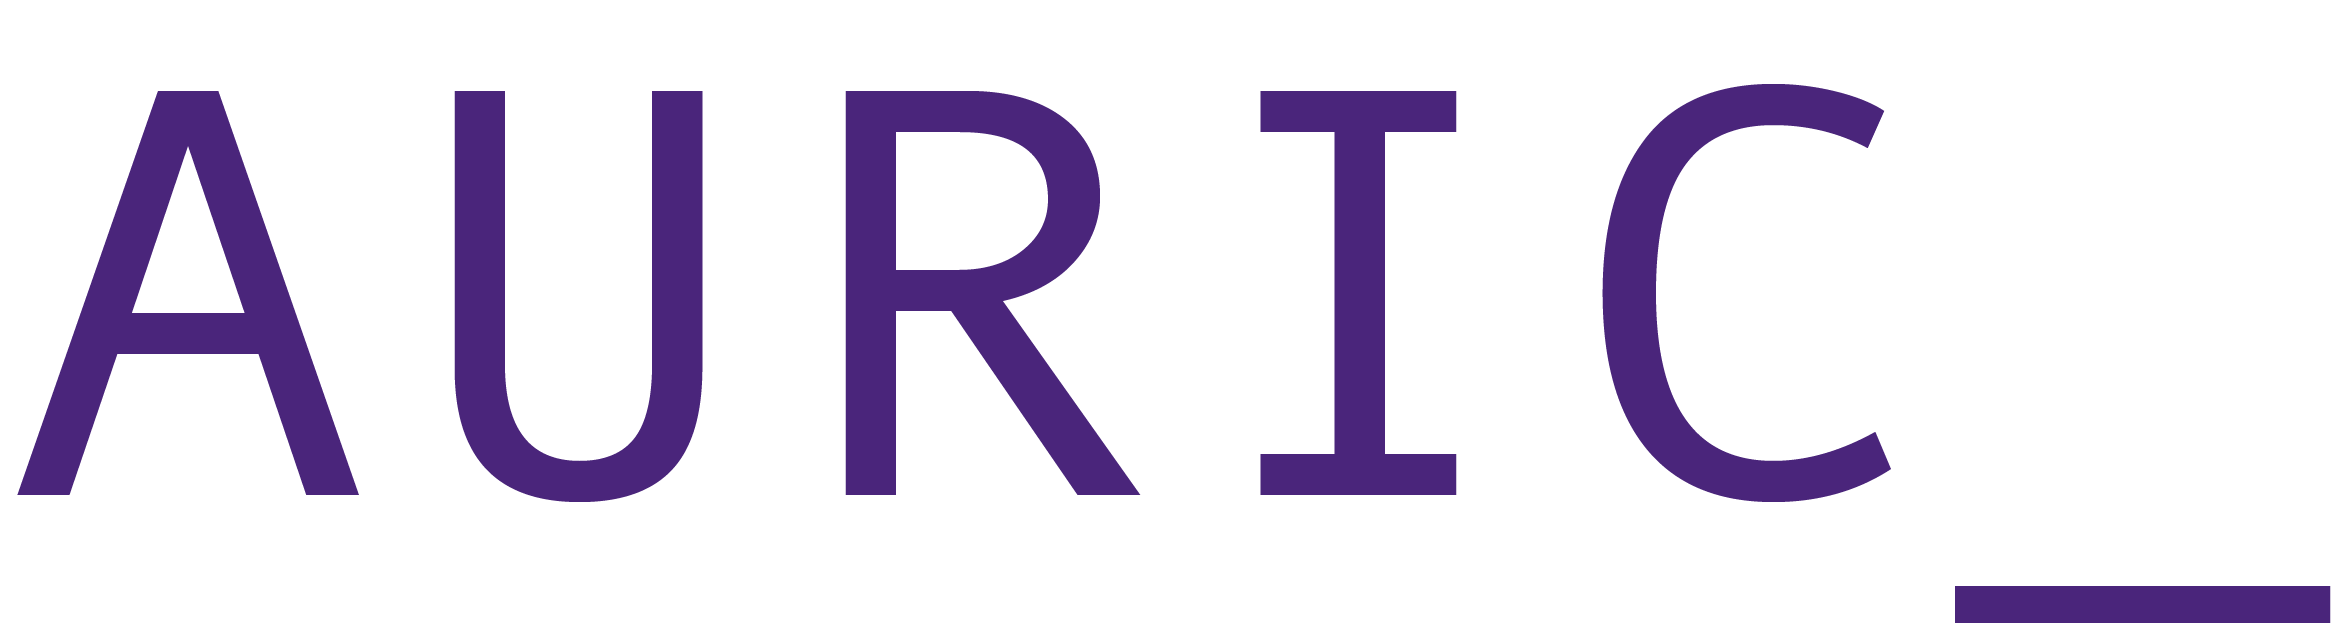 AURIC_bar logo-05.png